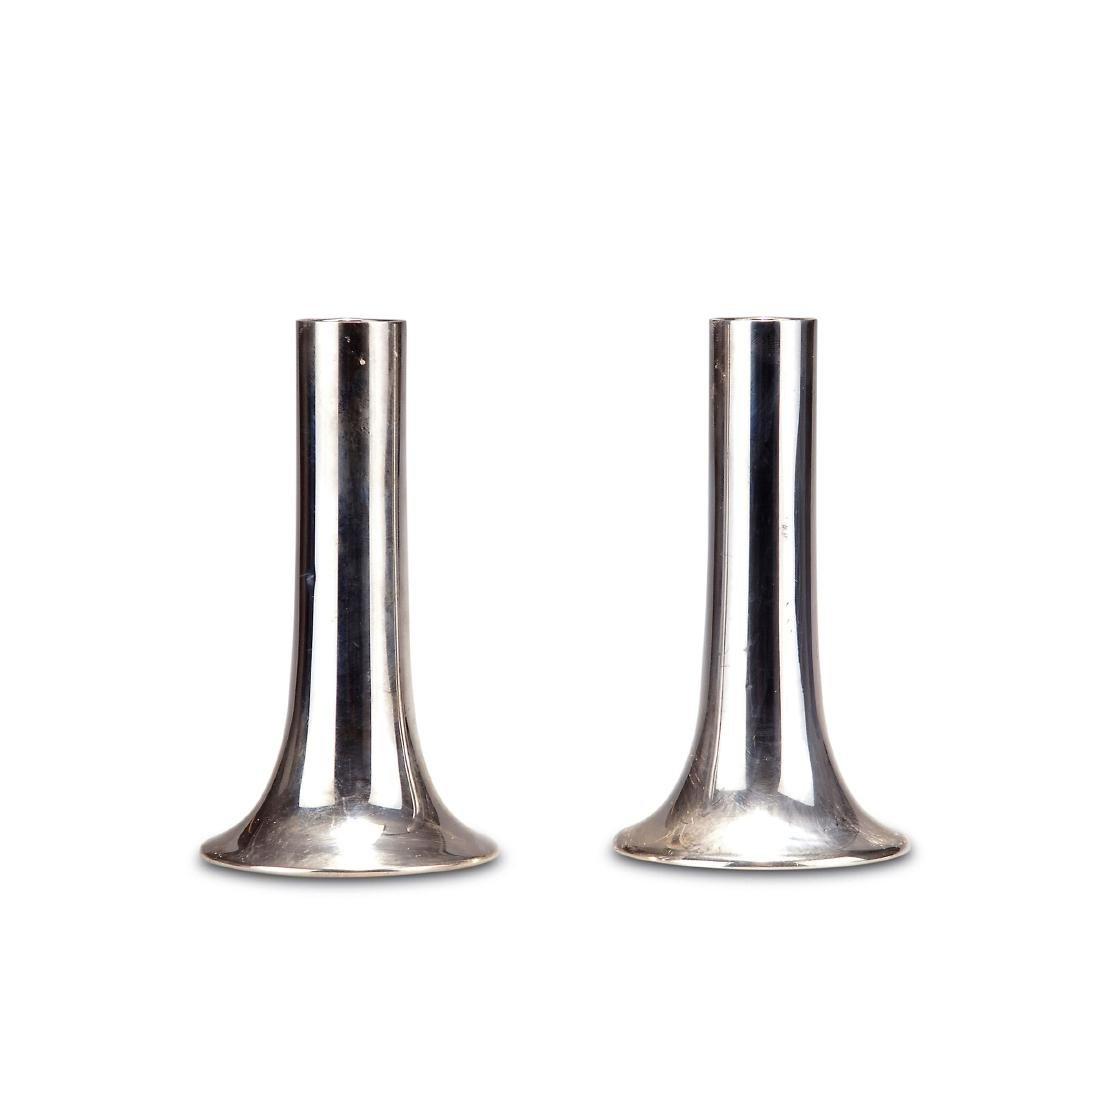 Pair of candlesticks, c. 1960